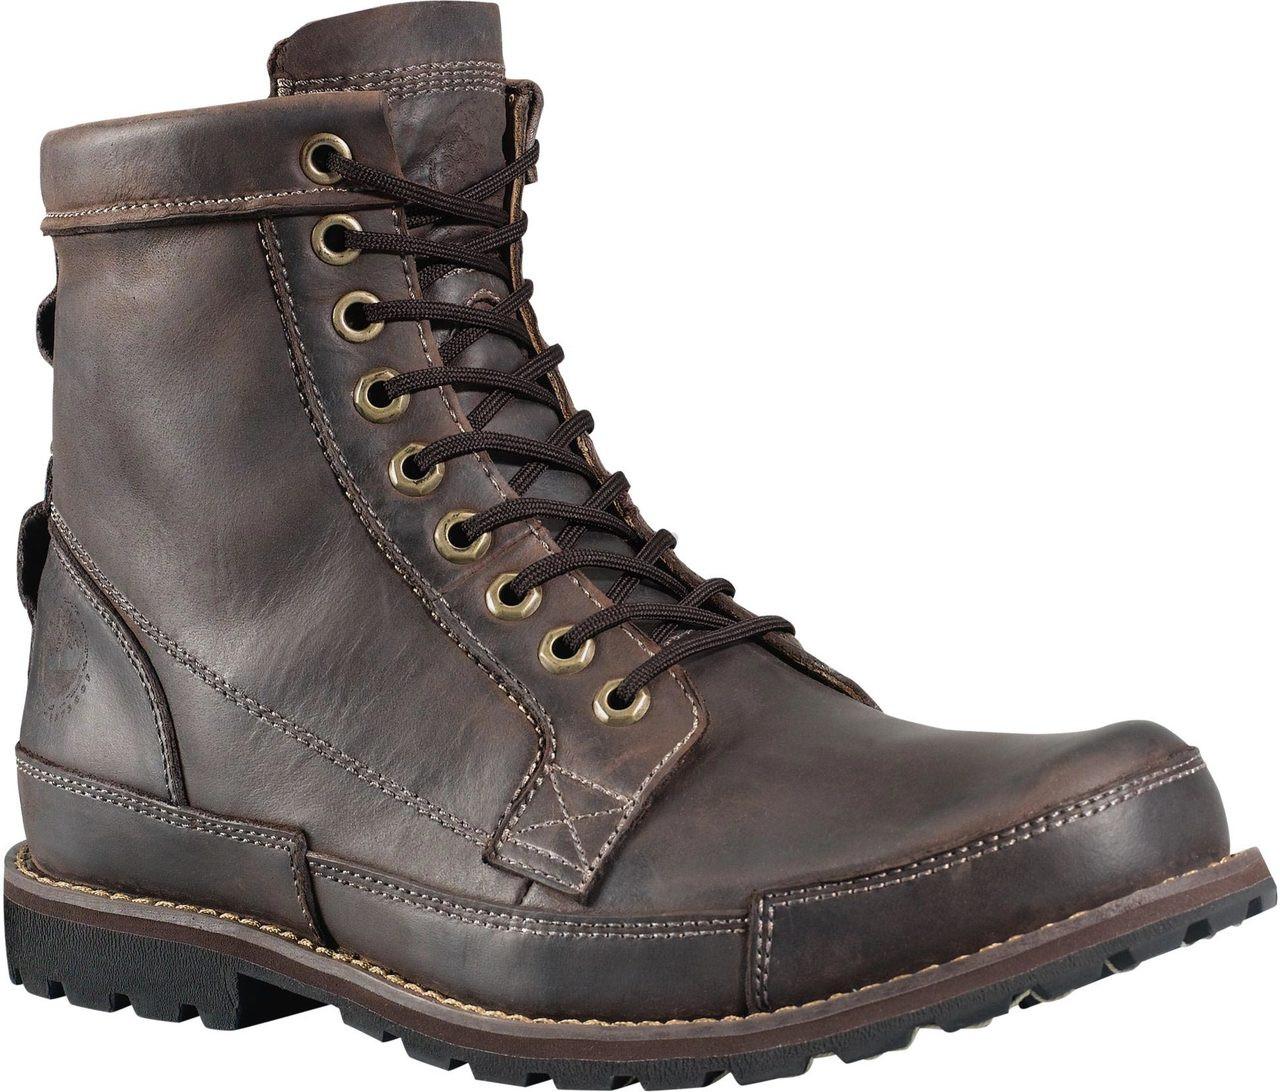 ... Boots; Timberland Men's Earthkeepers Original Leather 6-Inch. Dark Brown  · Dark Brown · Dark Brown Oiled Nubuck ...